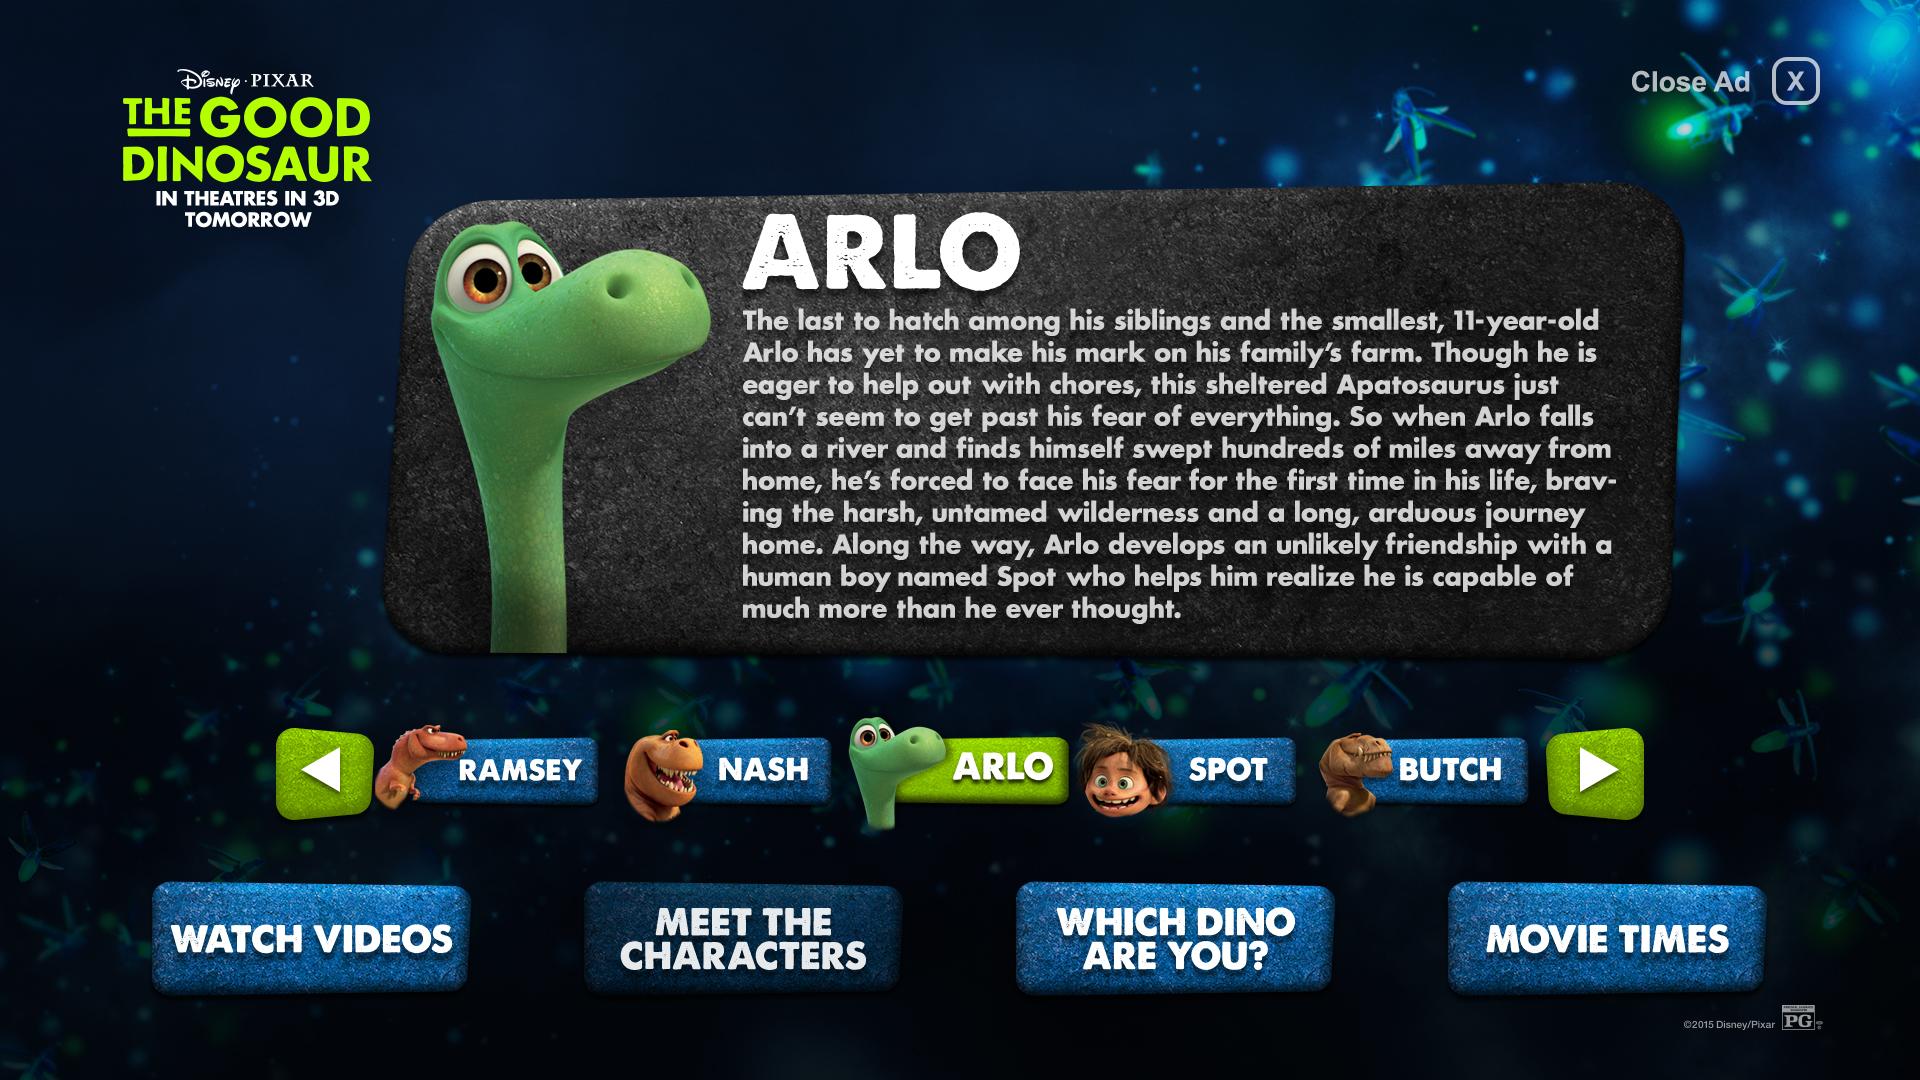 tgd_2_meet-characters-arlo